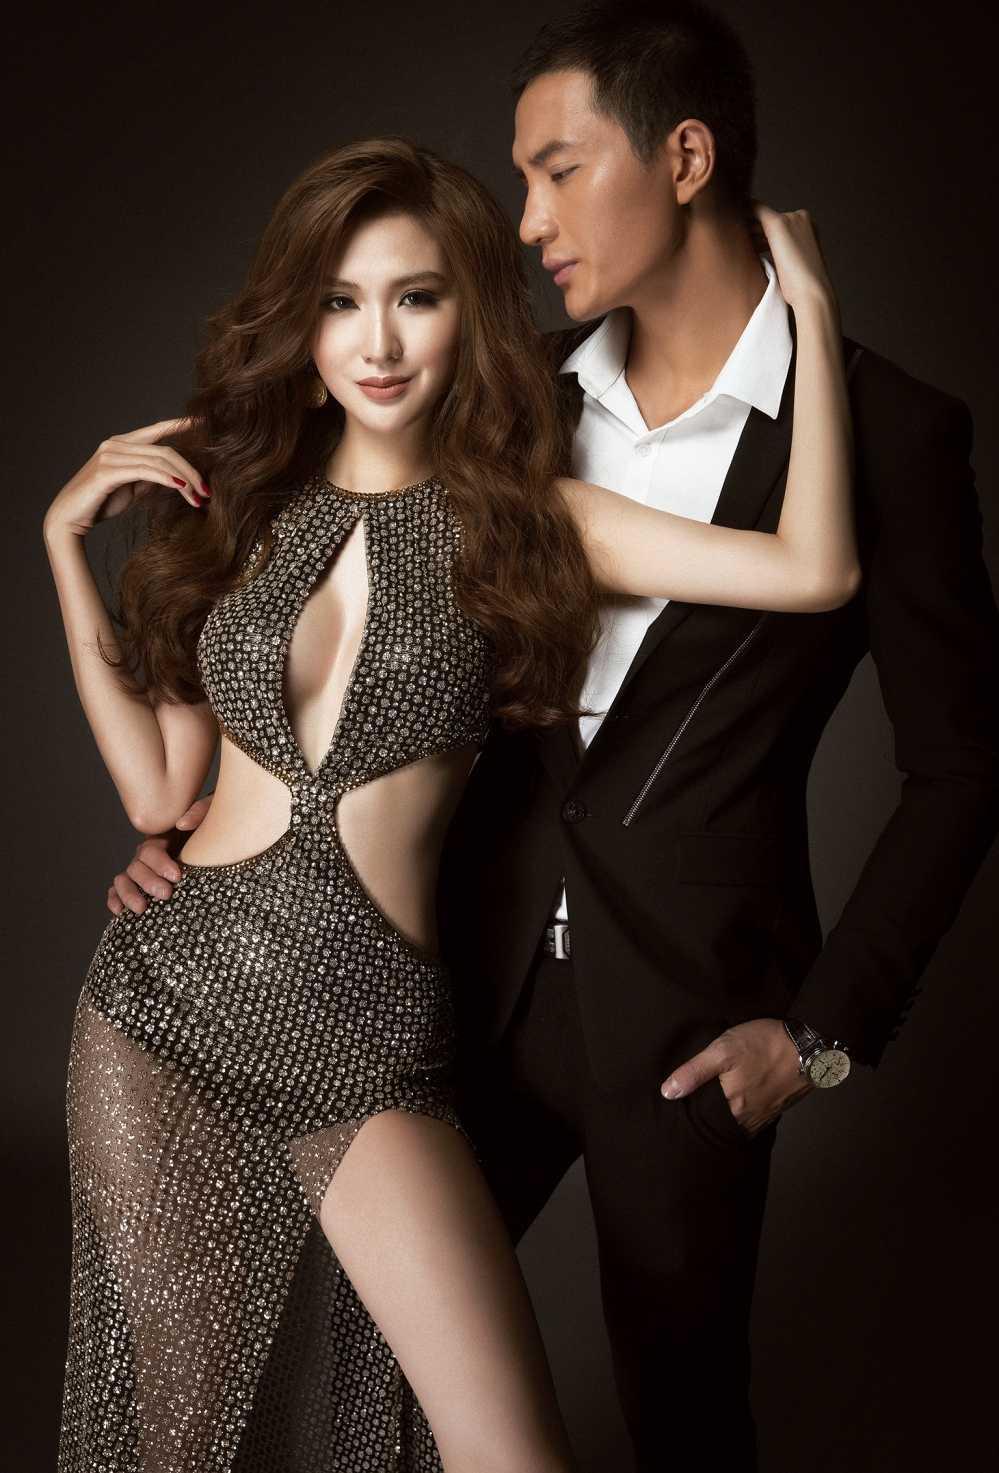 'Ga chien' cua Pham Huong goi cam ben Nam vuong toan cau hinh anh 8